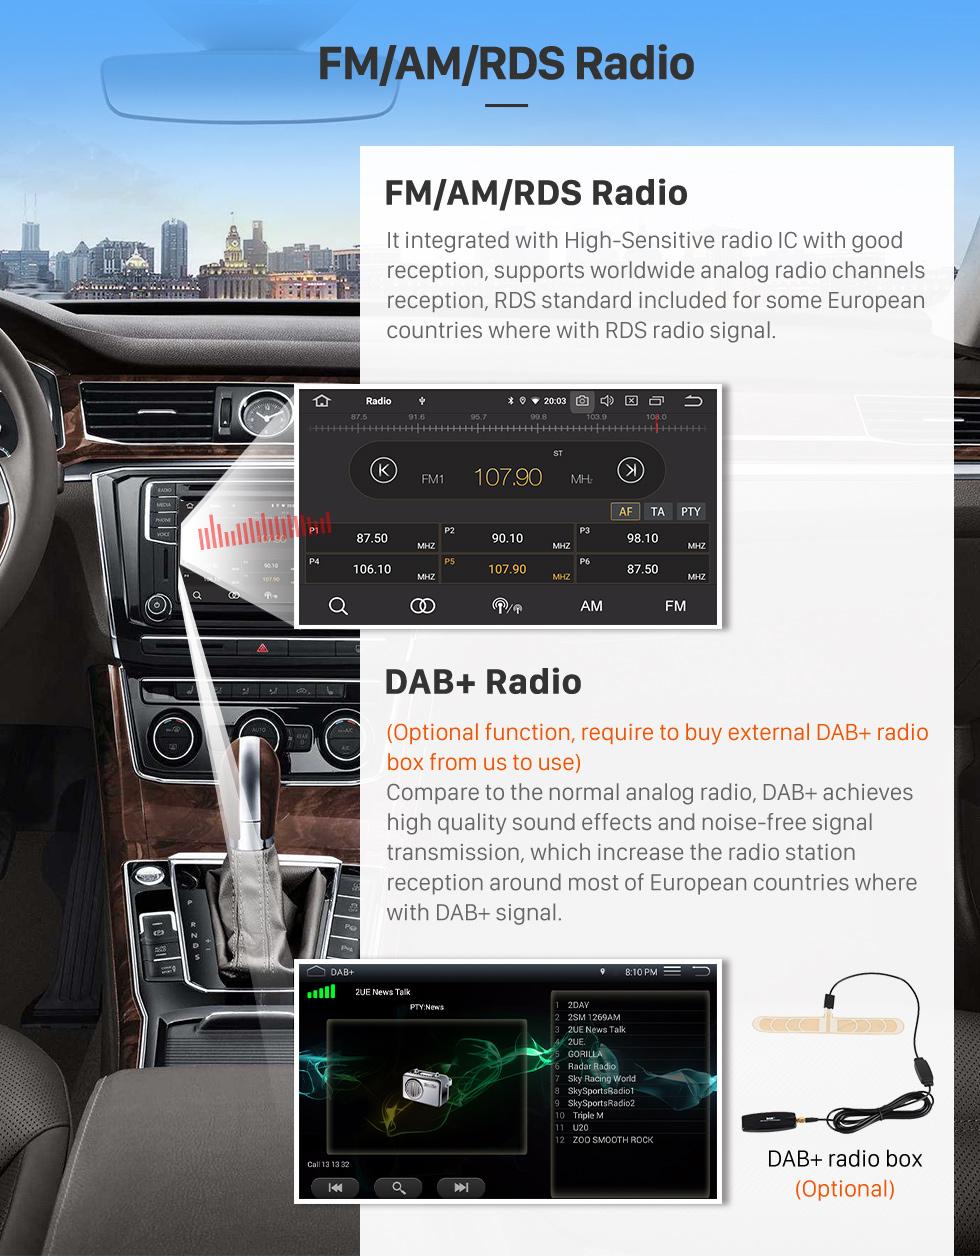 Seicane 9 pulgadas Android 9.0 2015 Mitsubishi TRITON Manual A / C 1024 * 600 Radio con pantalla táctil con GPS Navi USB FM Bluetooth WIFI compatible RDS Carplay 4G Reproductor de DVD